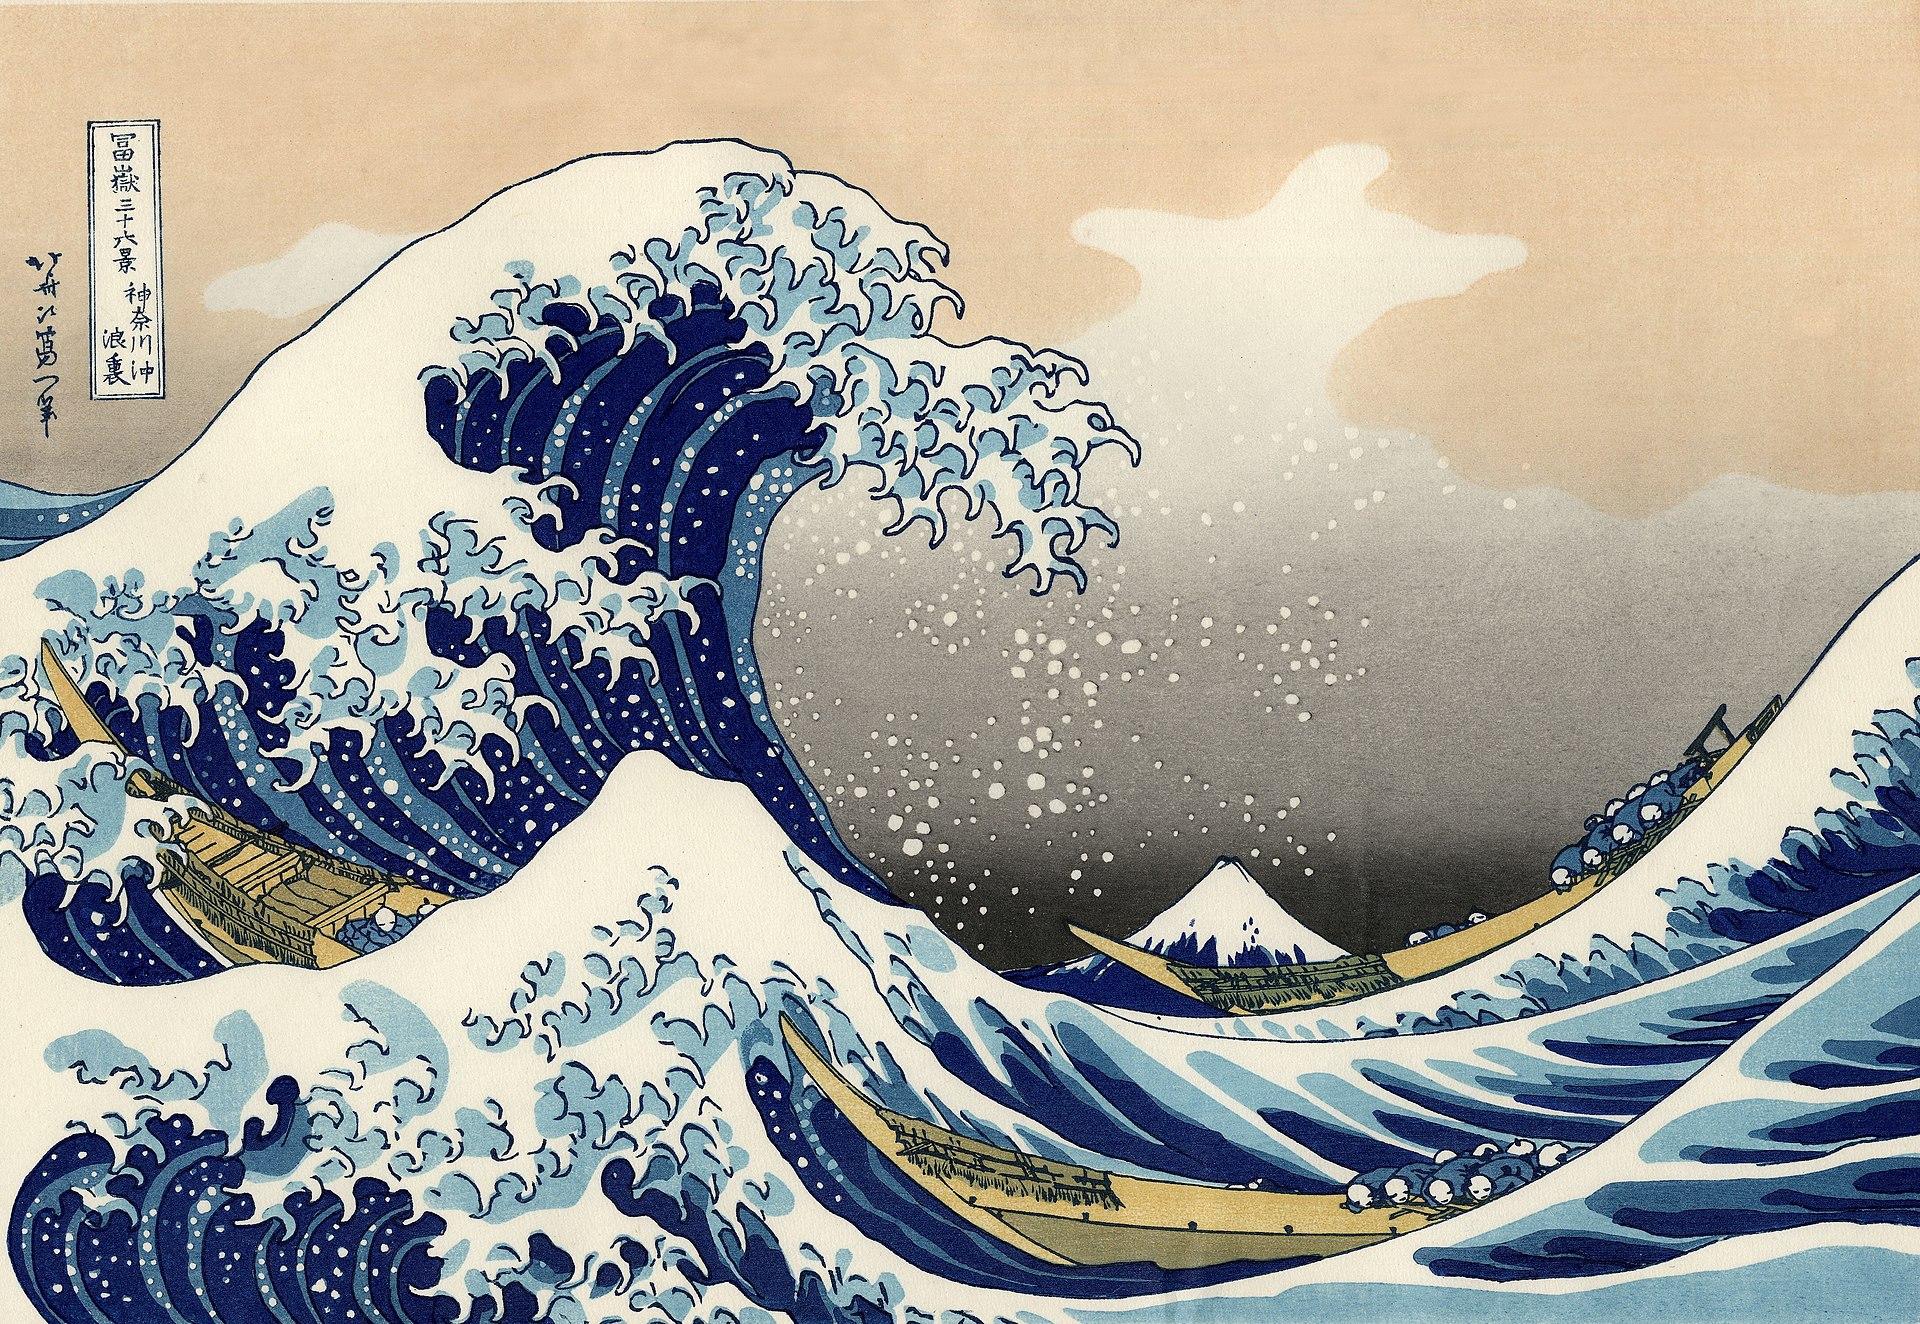 Hokusai's Die Große Welle Vor Kanagawa, 1831 | Ukiyo-e